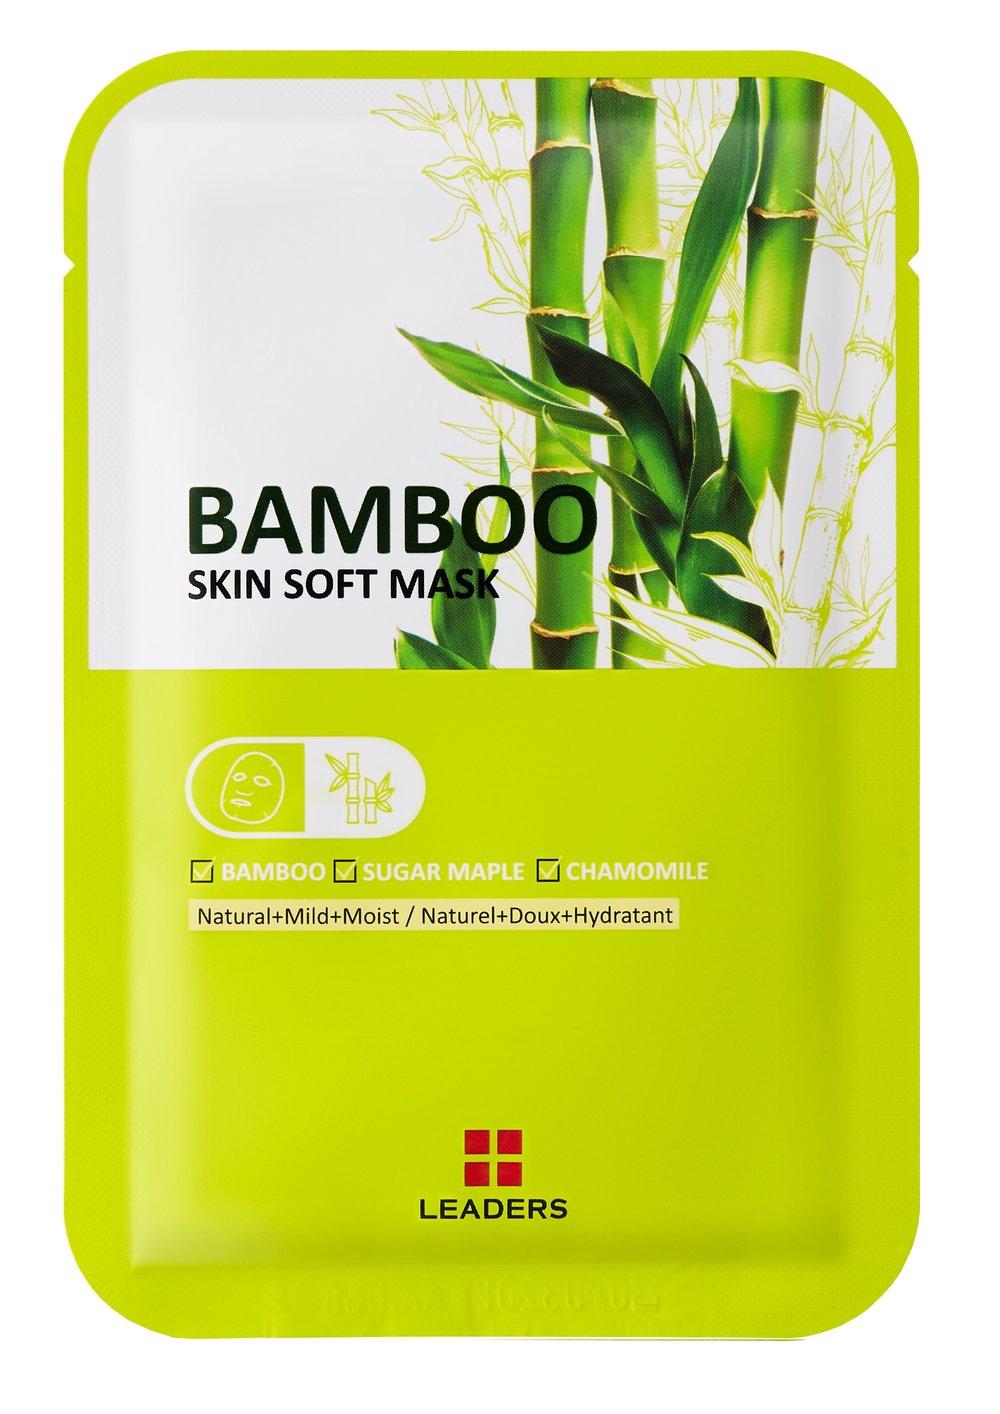 SkinSoft_Bamboo.jpg